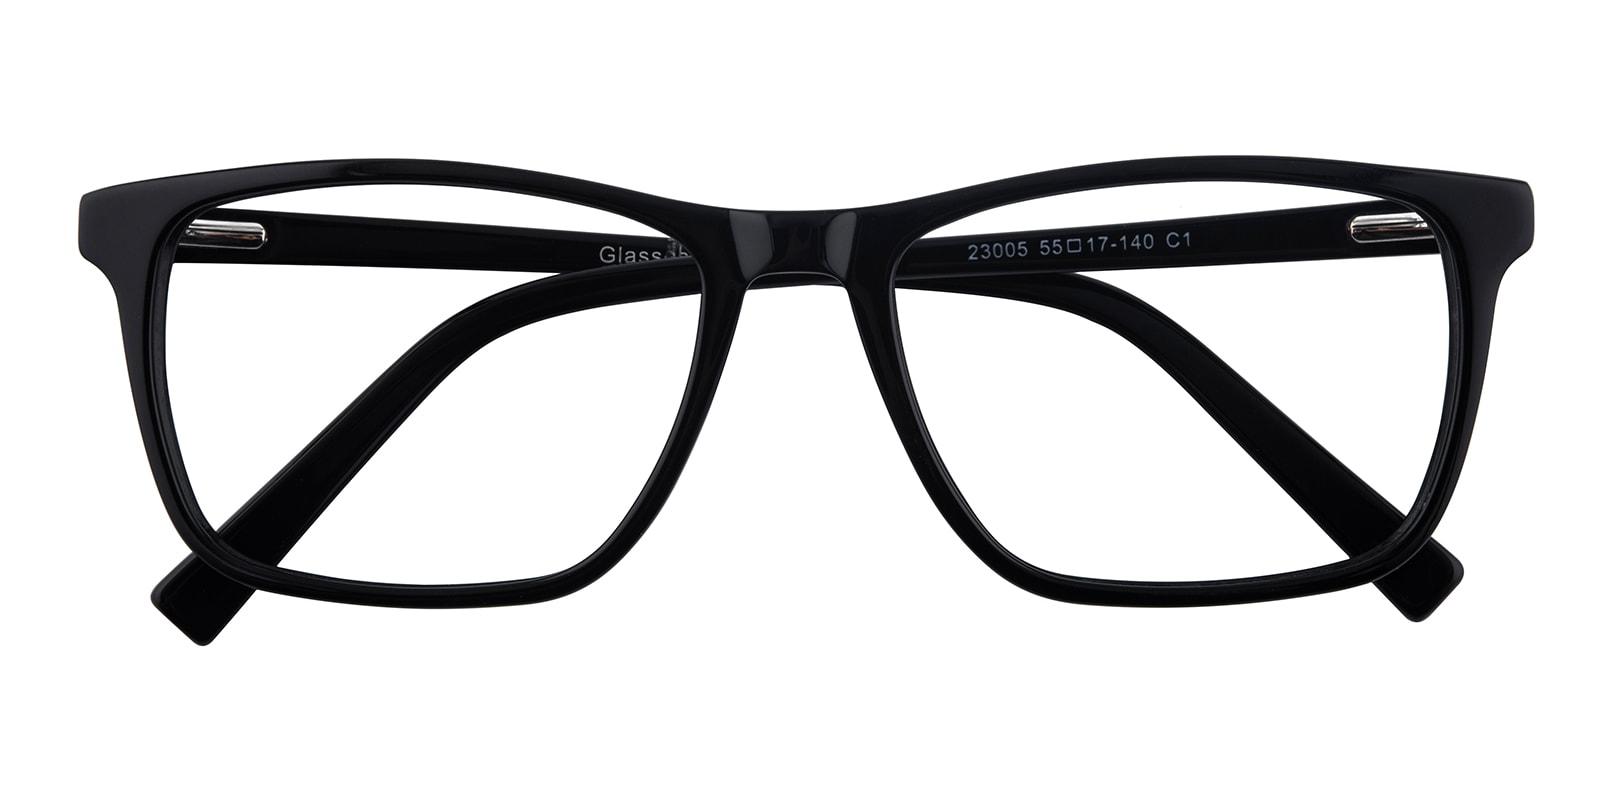 Blume Rectangle - Black Eyeglasses | GlassesShop.com